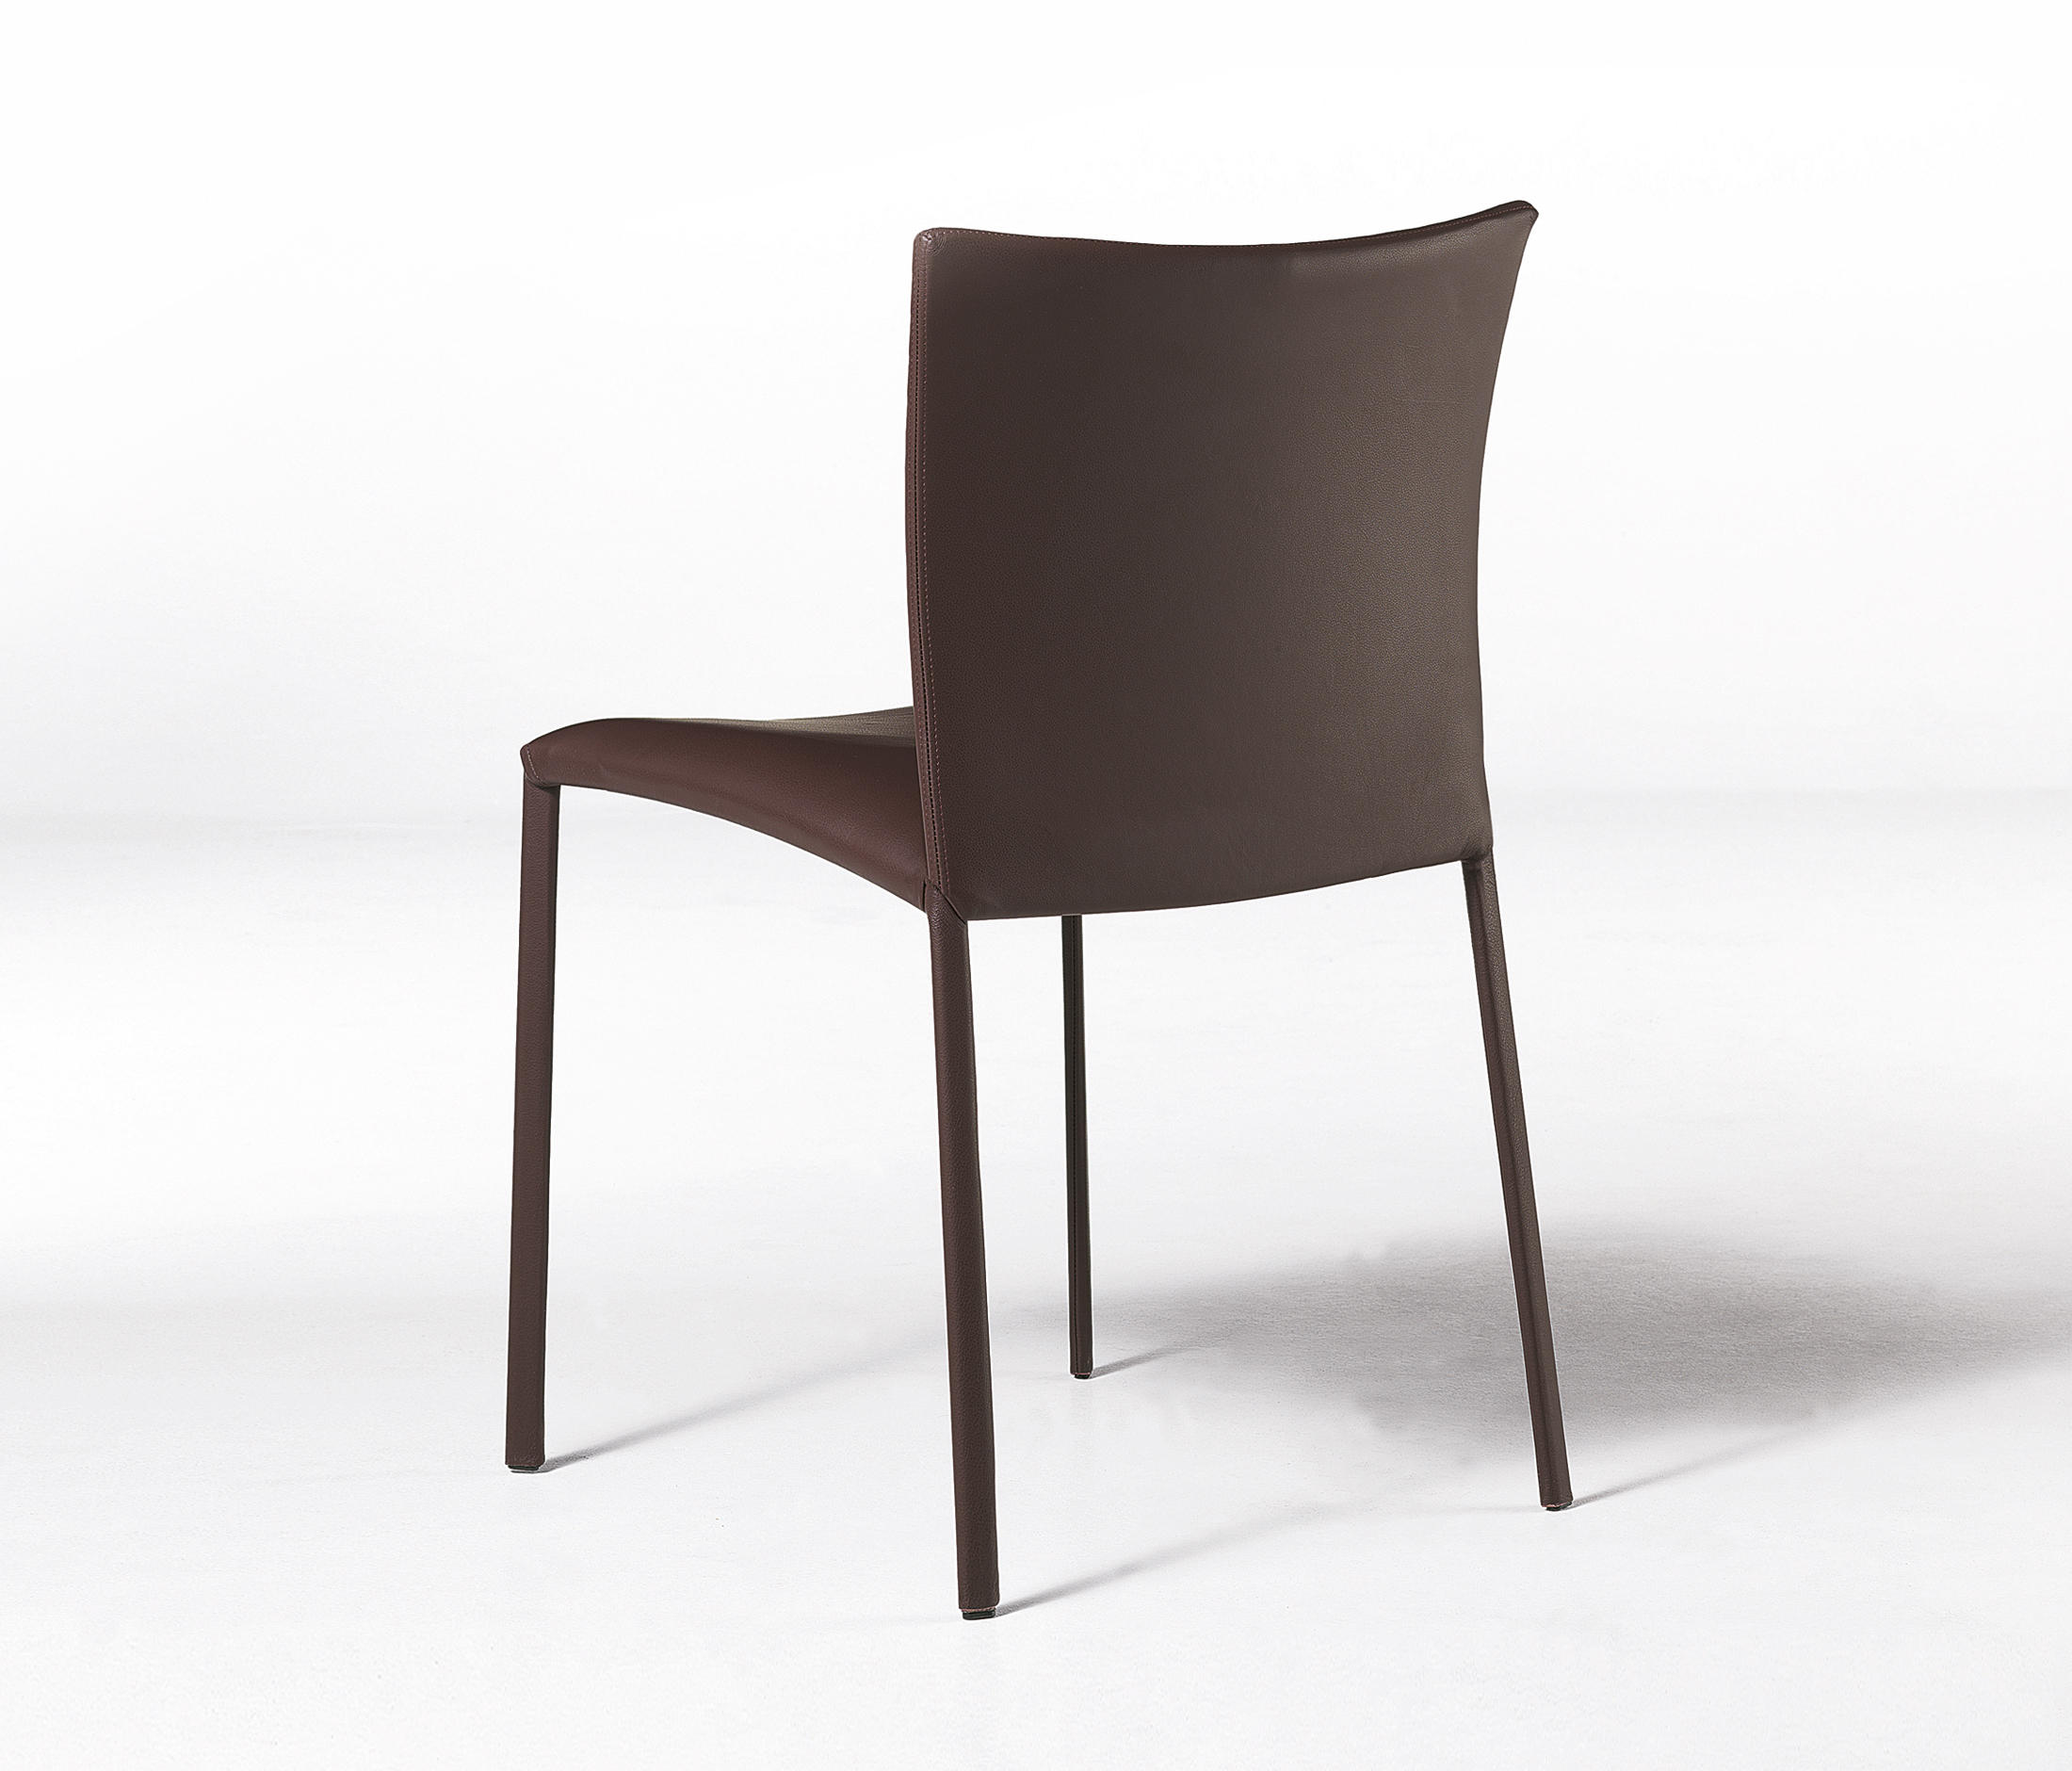 NOBILE SOFT | 2076 - Stühle von Draenert | Architonic